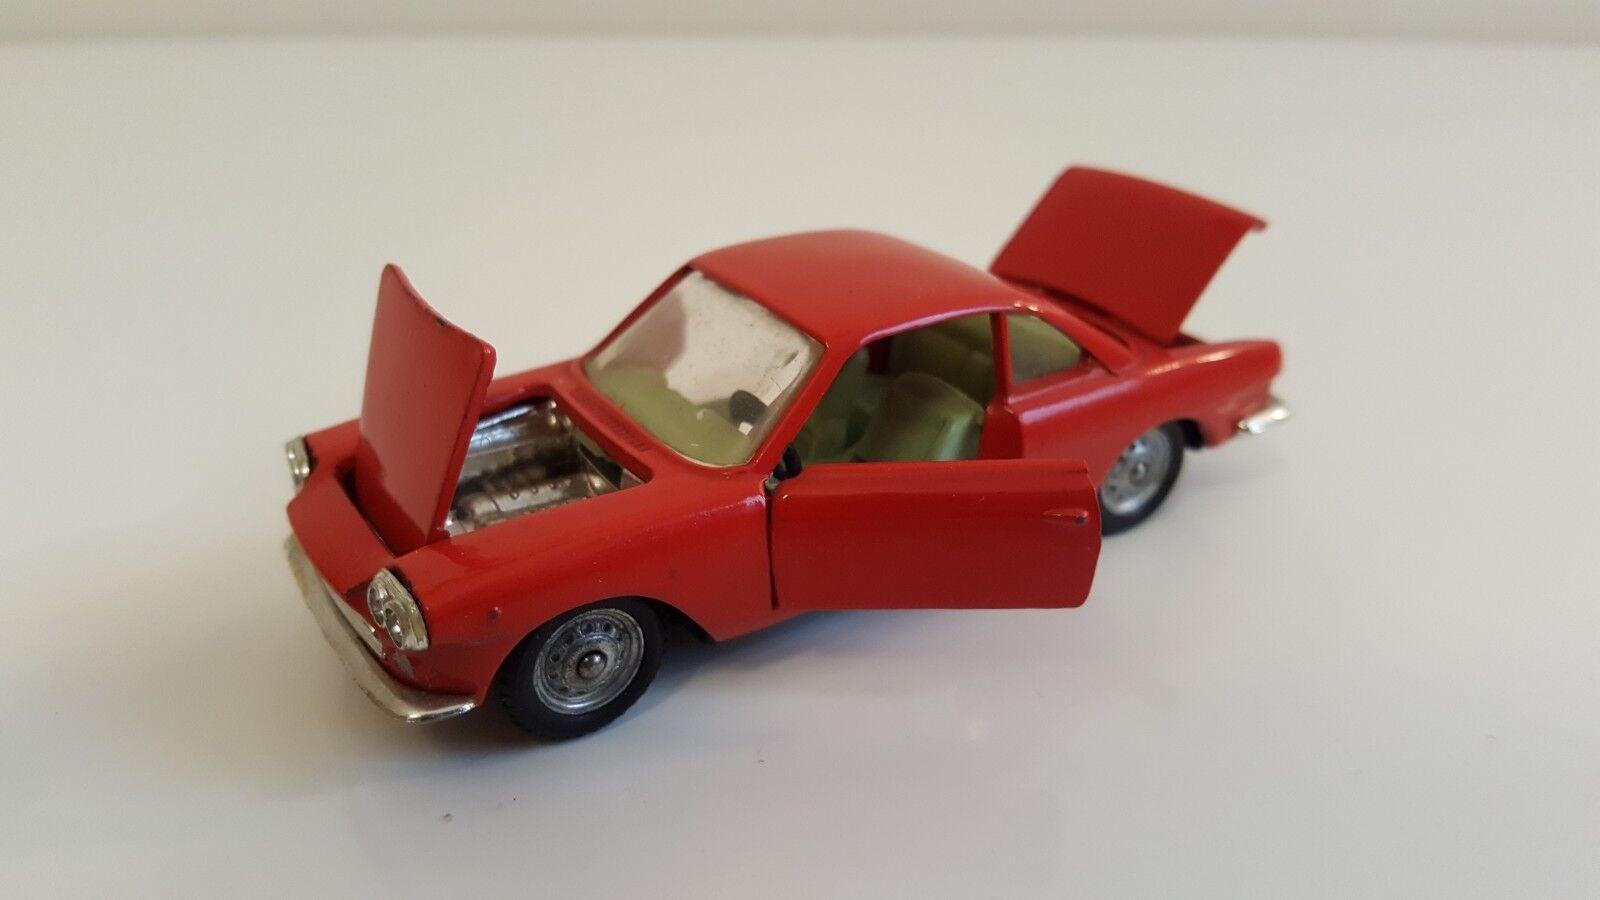 Politoys - 502 - Fiat Siata 1500 VN Mint (1 43)